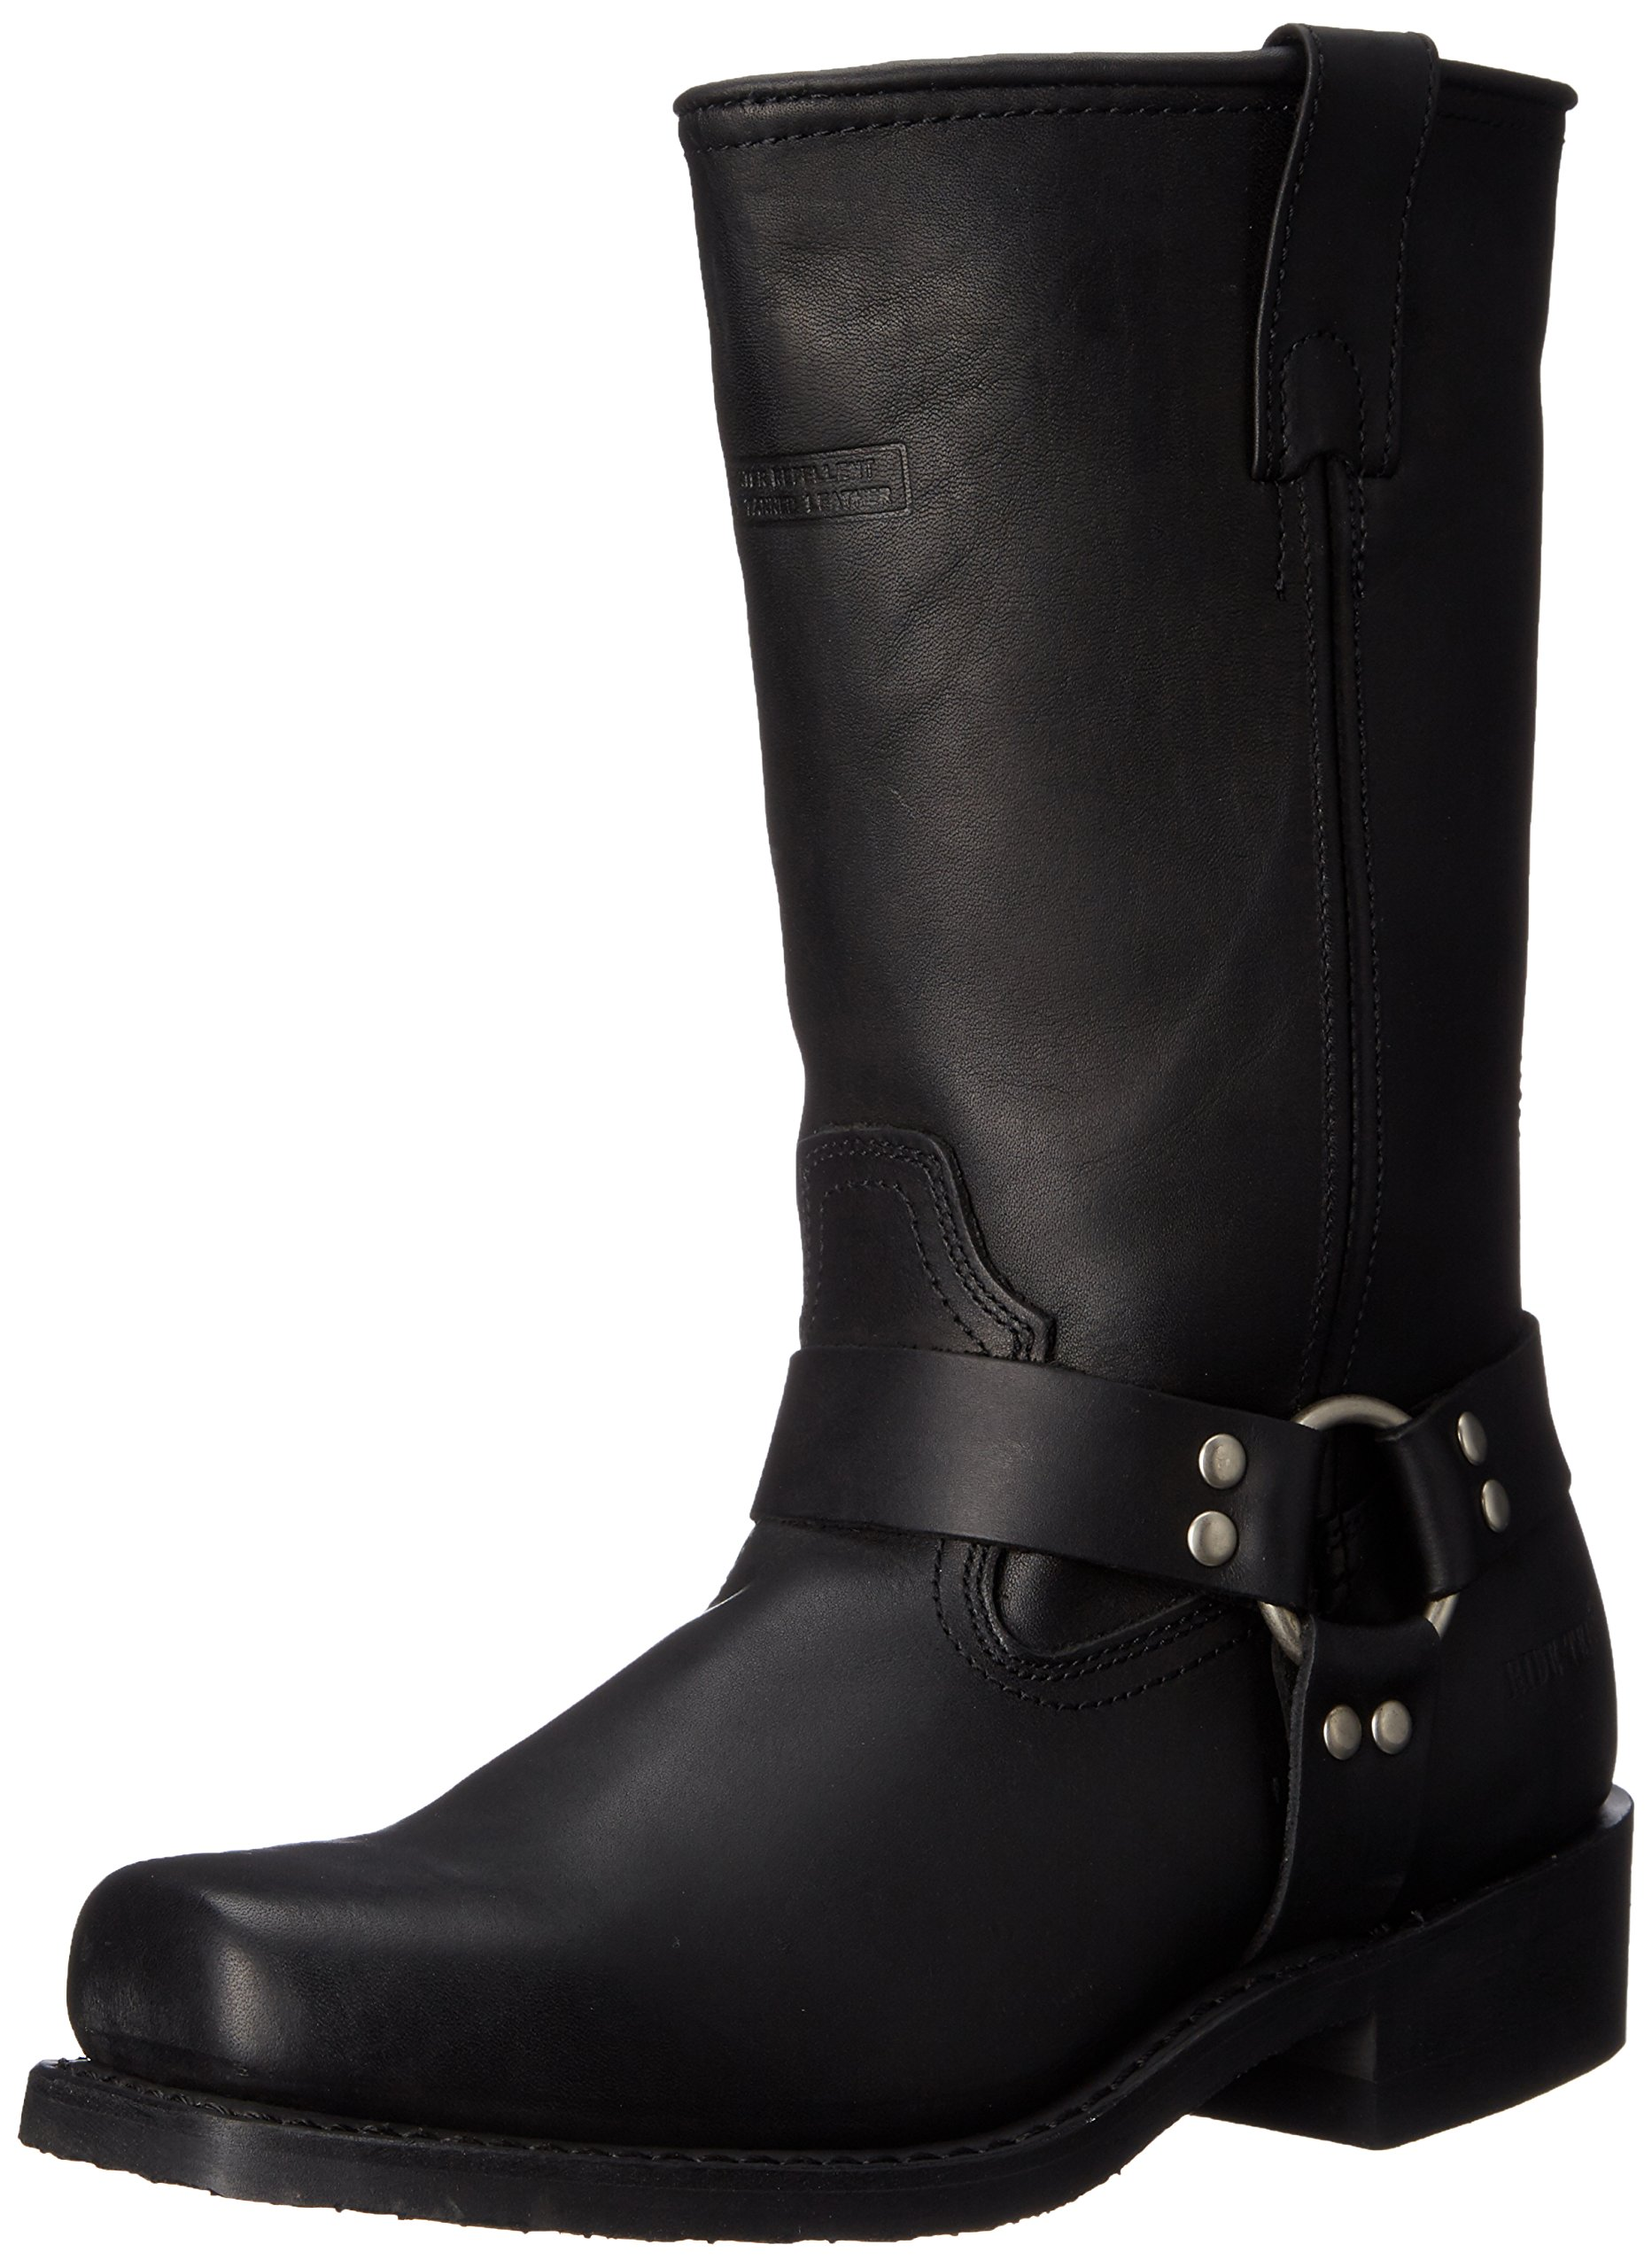 AdTec Men's 11 Inch Harness Motorcycle Boot, Black, 12 M US